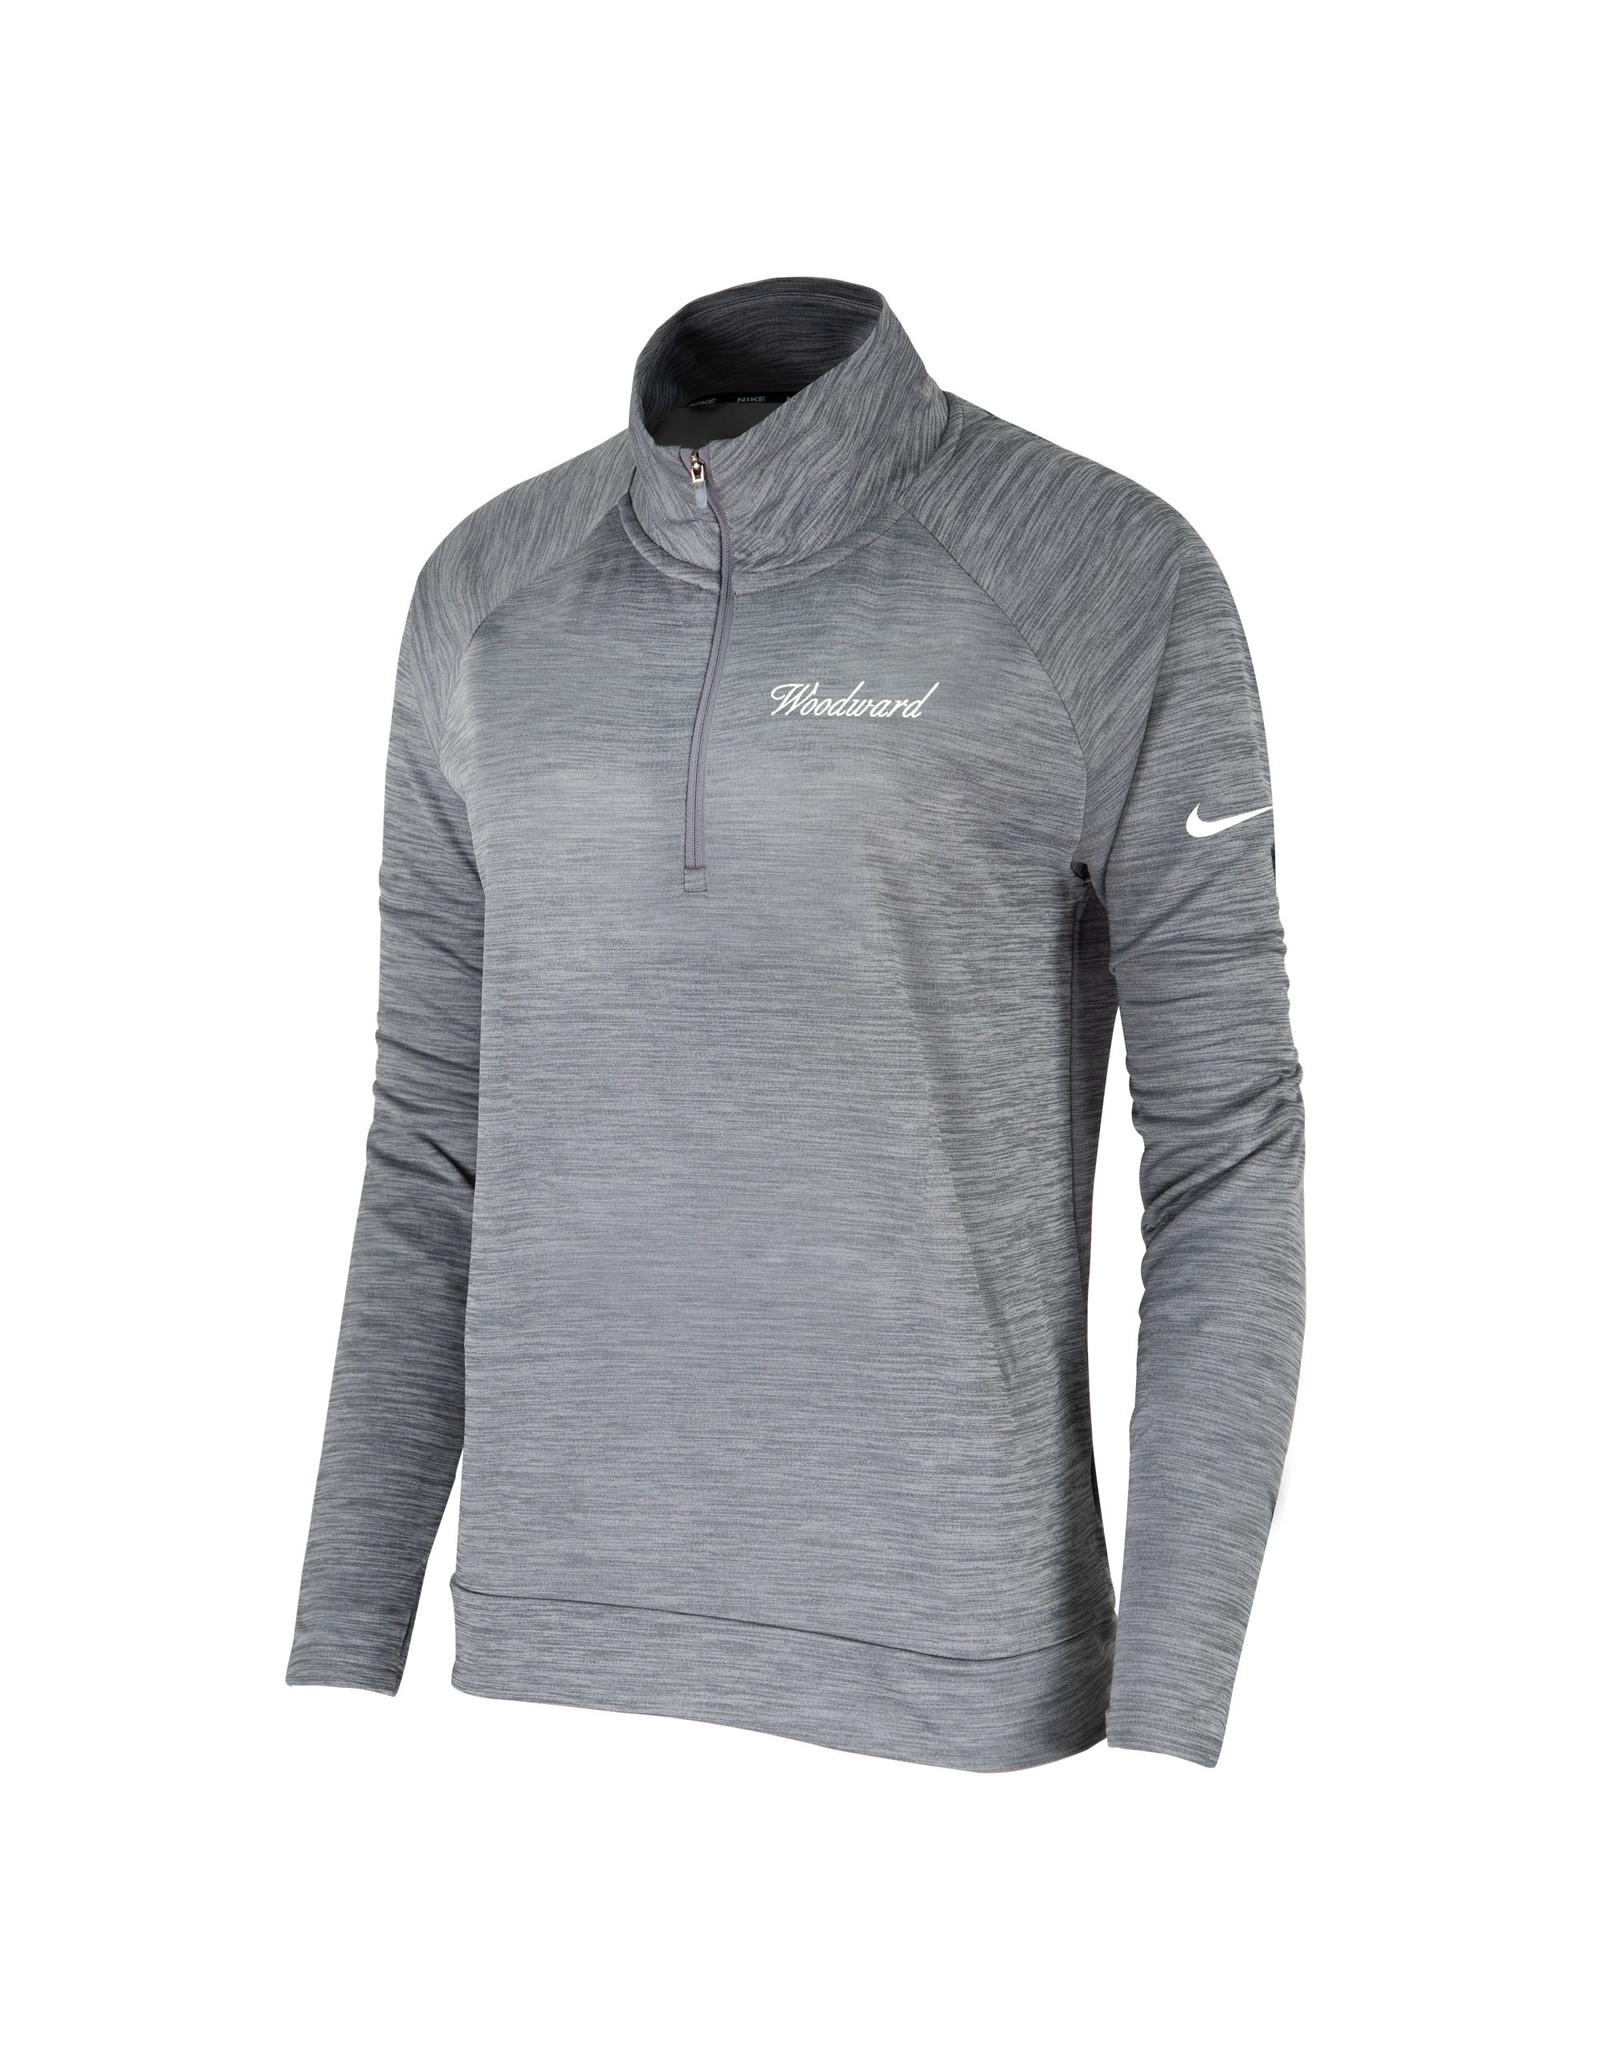 NIKE Ladies Dri-Fit Pacer 1/4 Zip Pullover in Grey by NIKE